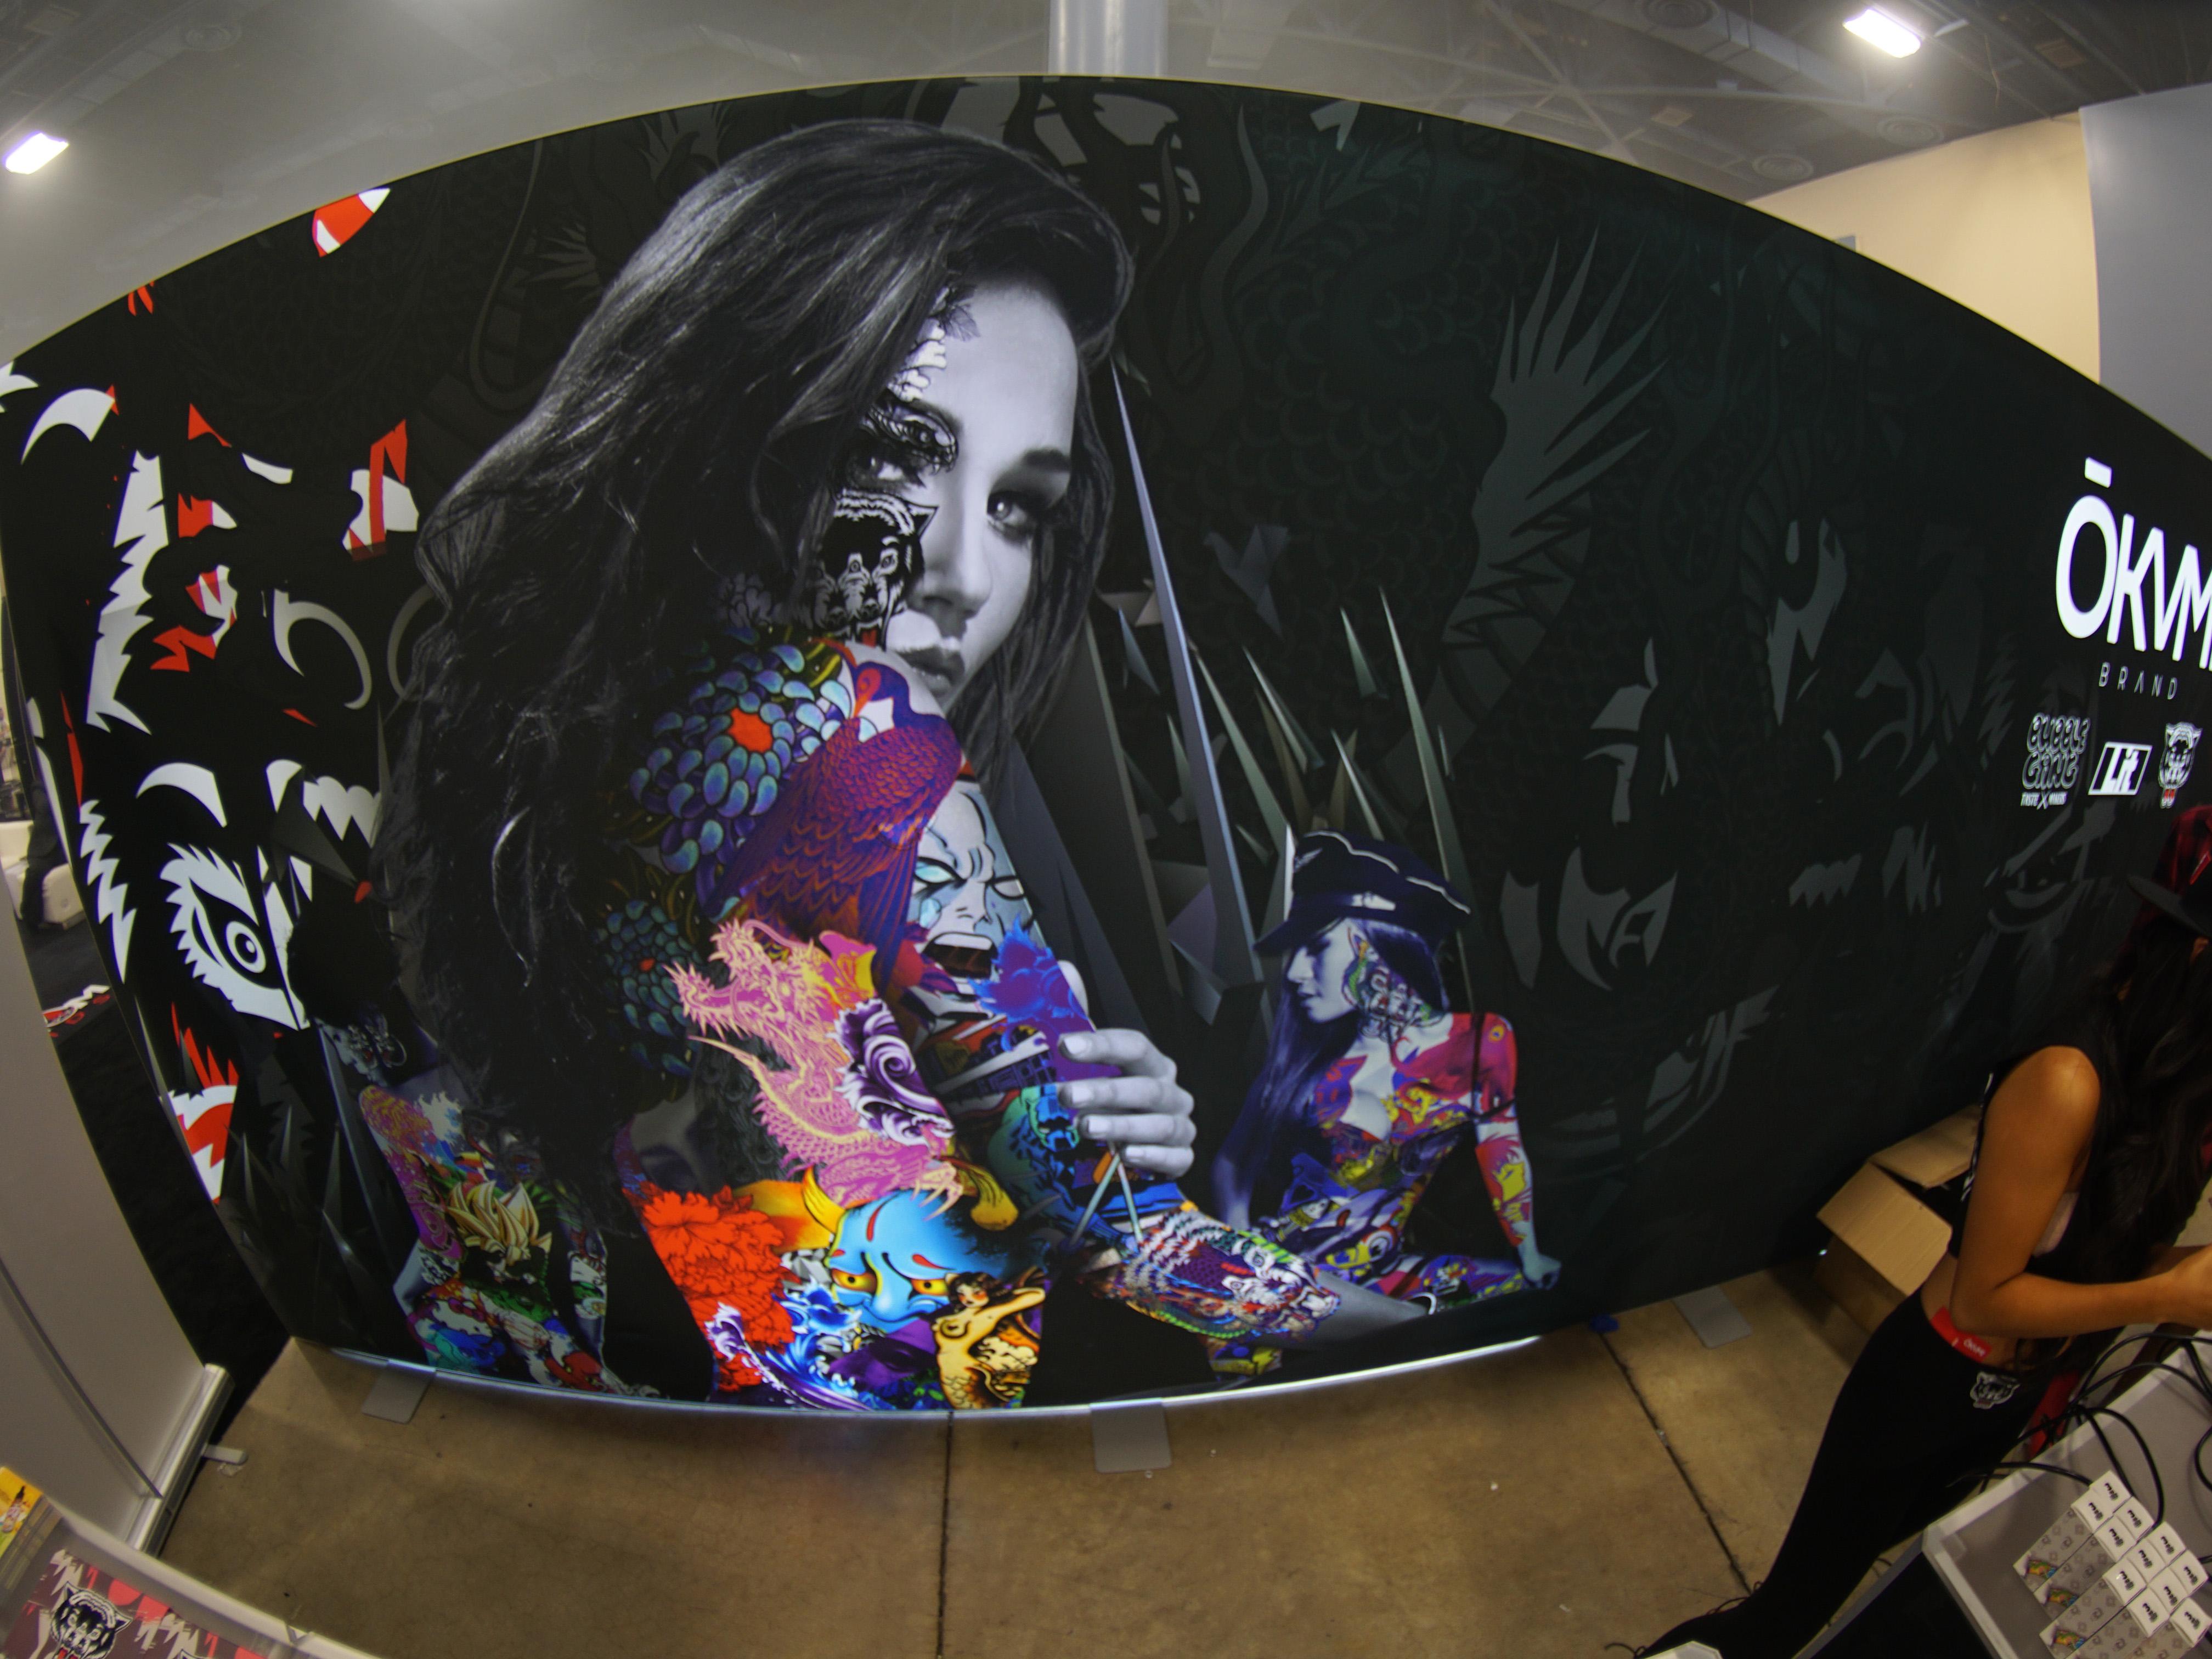 okami-tradeshow-booth